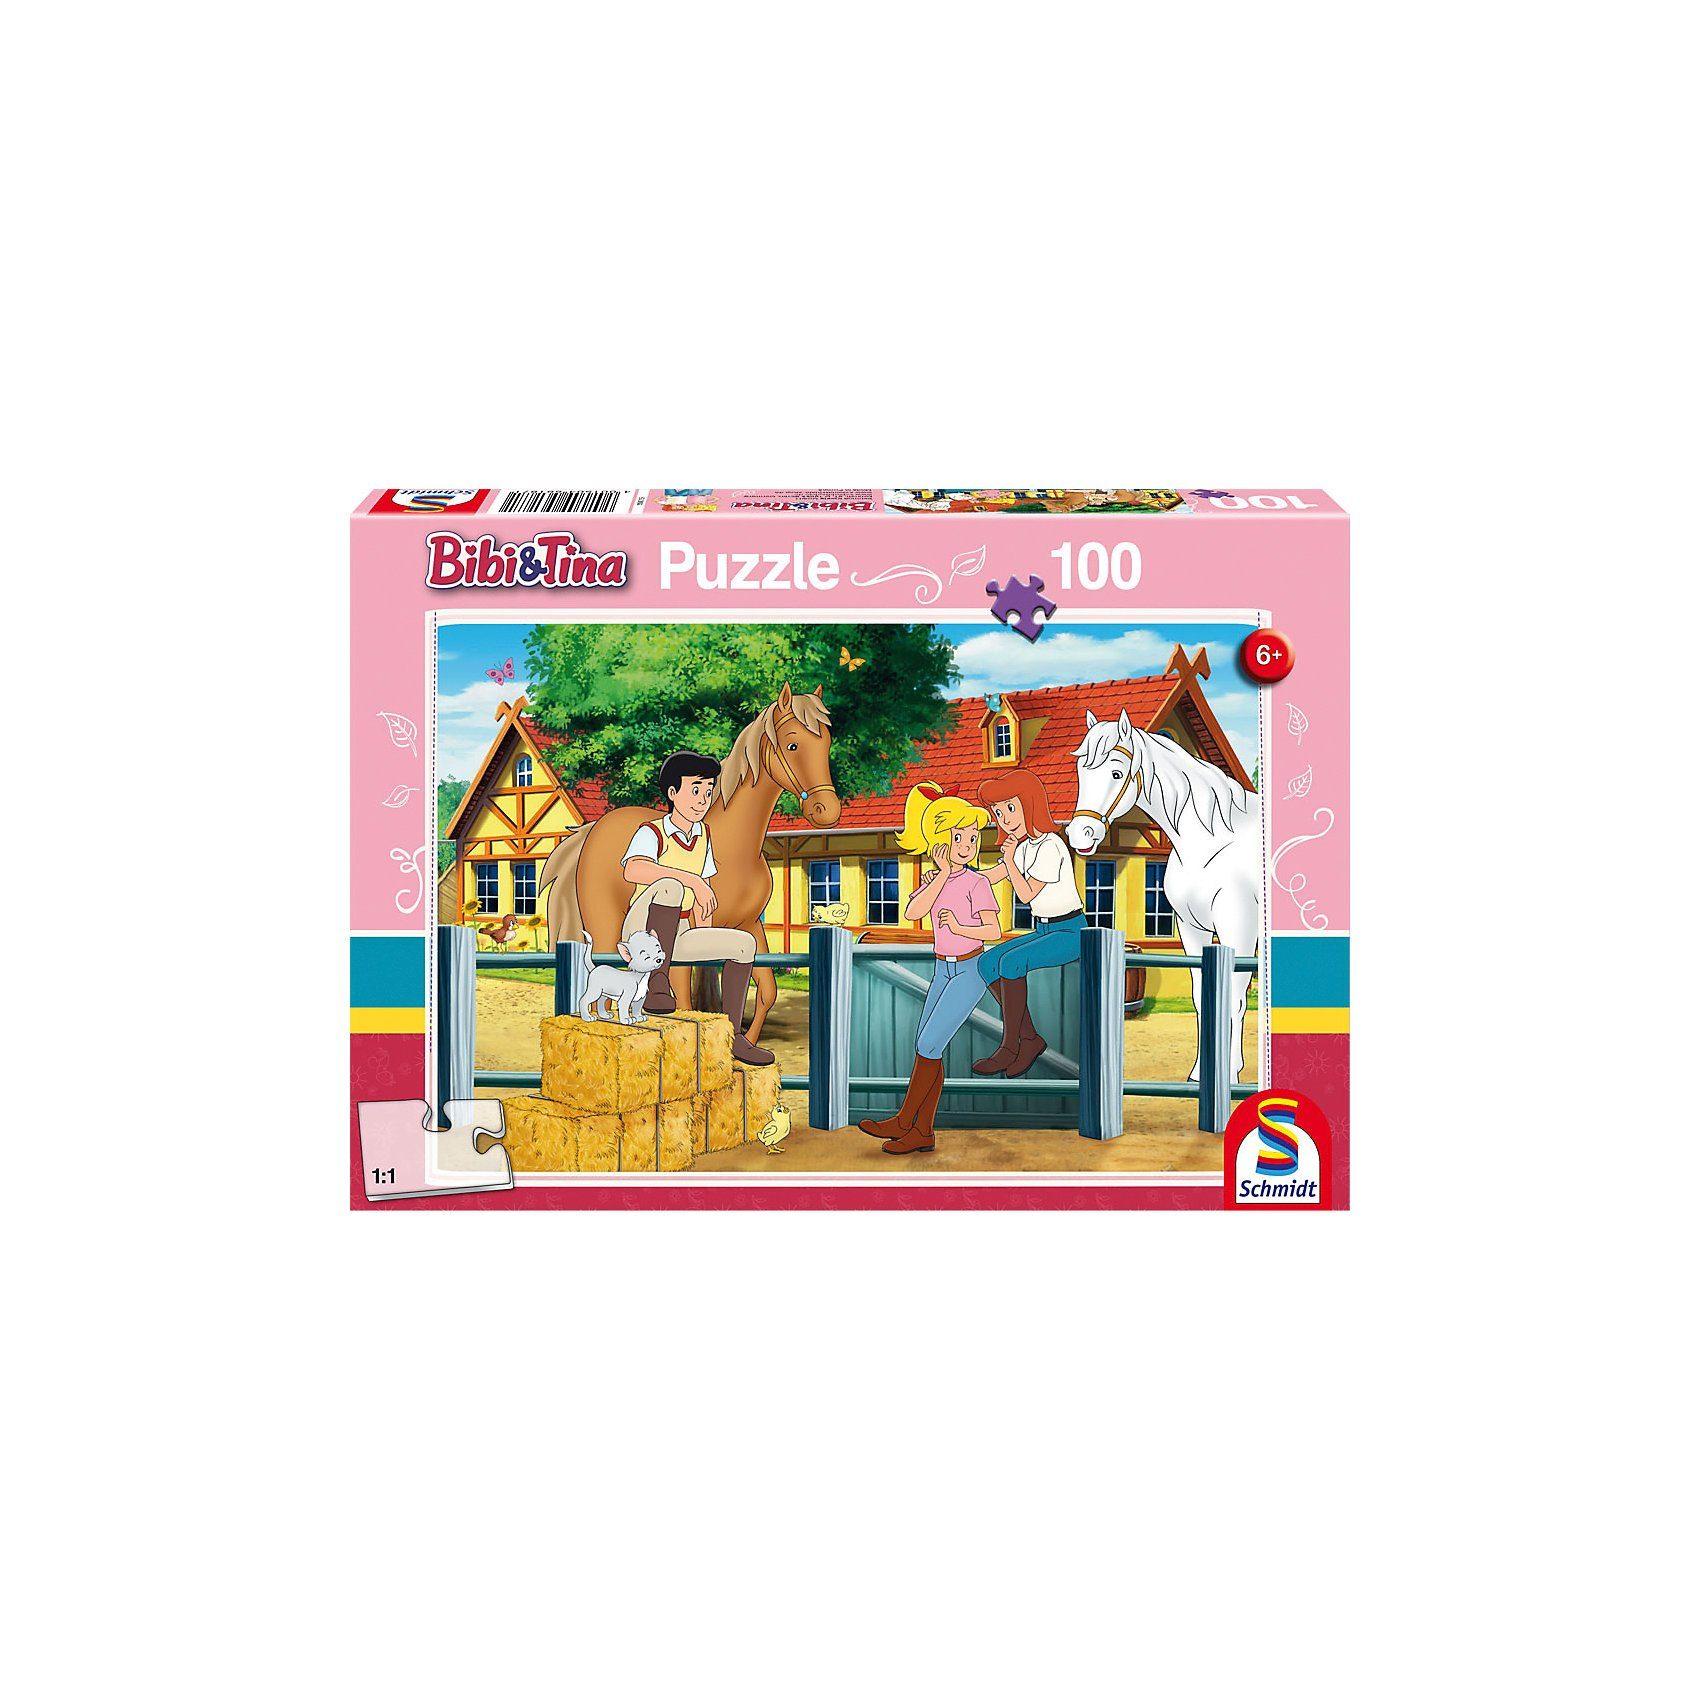 Schmidt Spiele Puzzle 100 Teile Bibi & Tina, Auf dem Martinshof